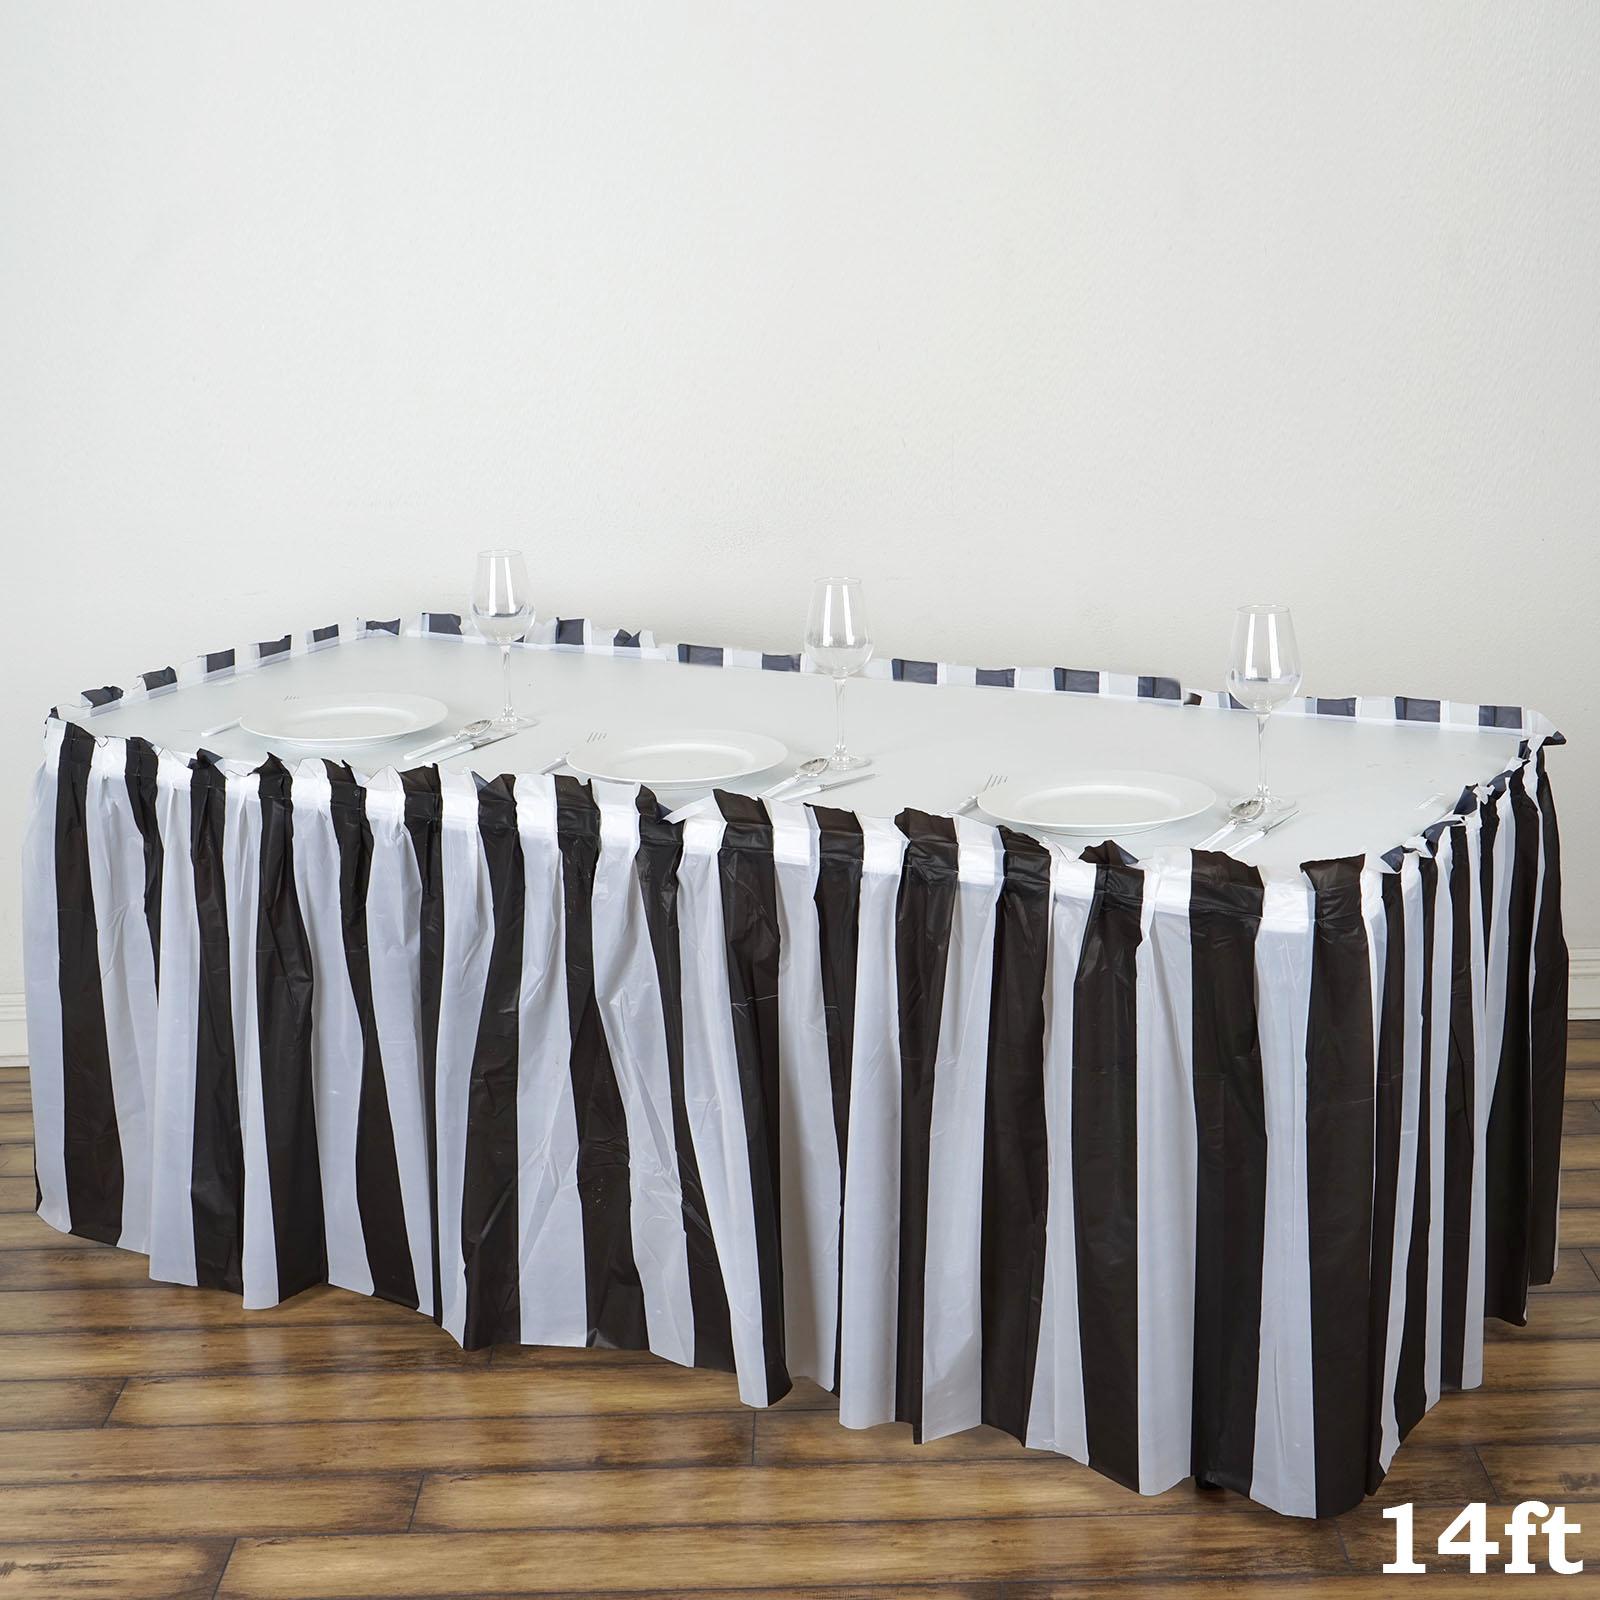 Stripes-Plastic-TABLE-SKIRT-14-feet-x-29-034-Wedding-Party-Dinner-Decorations-SALE thumbnail 3